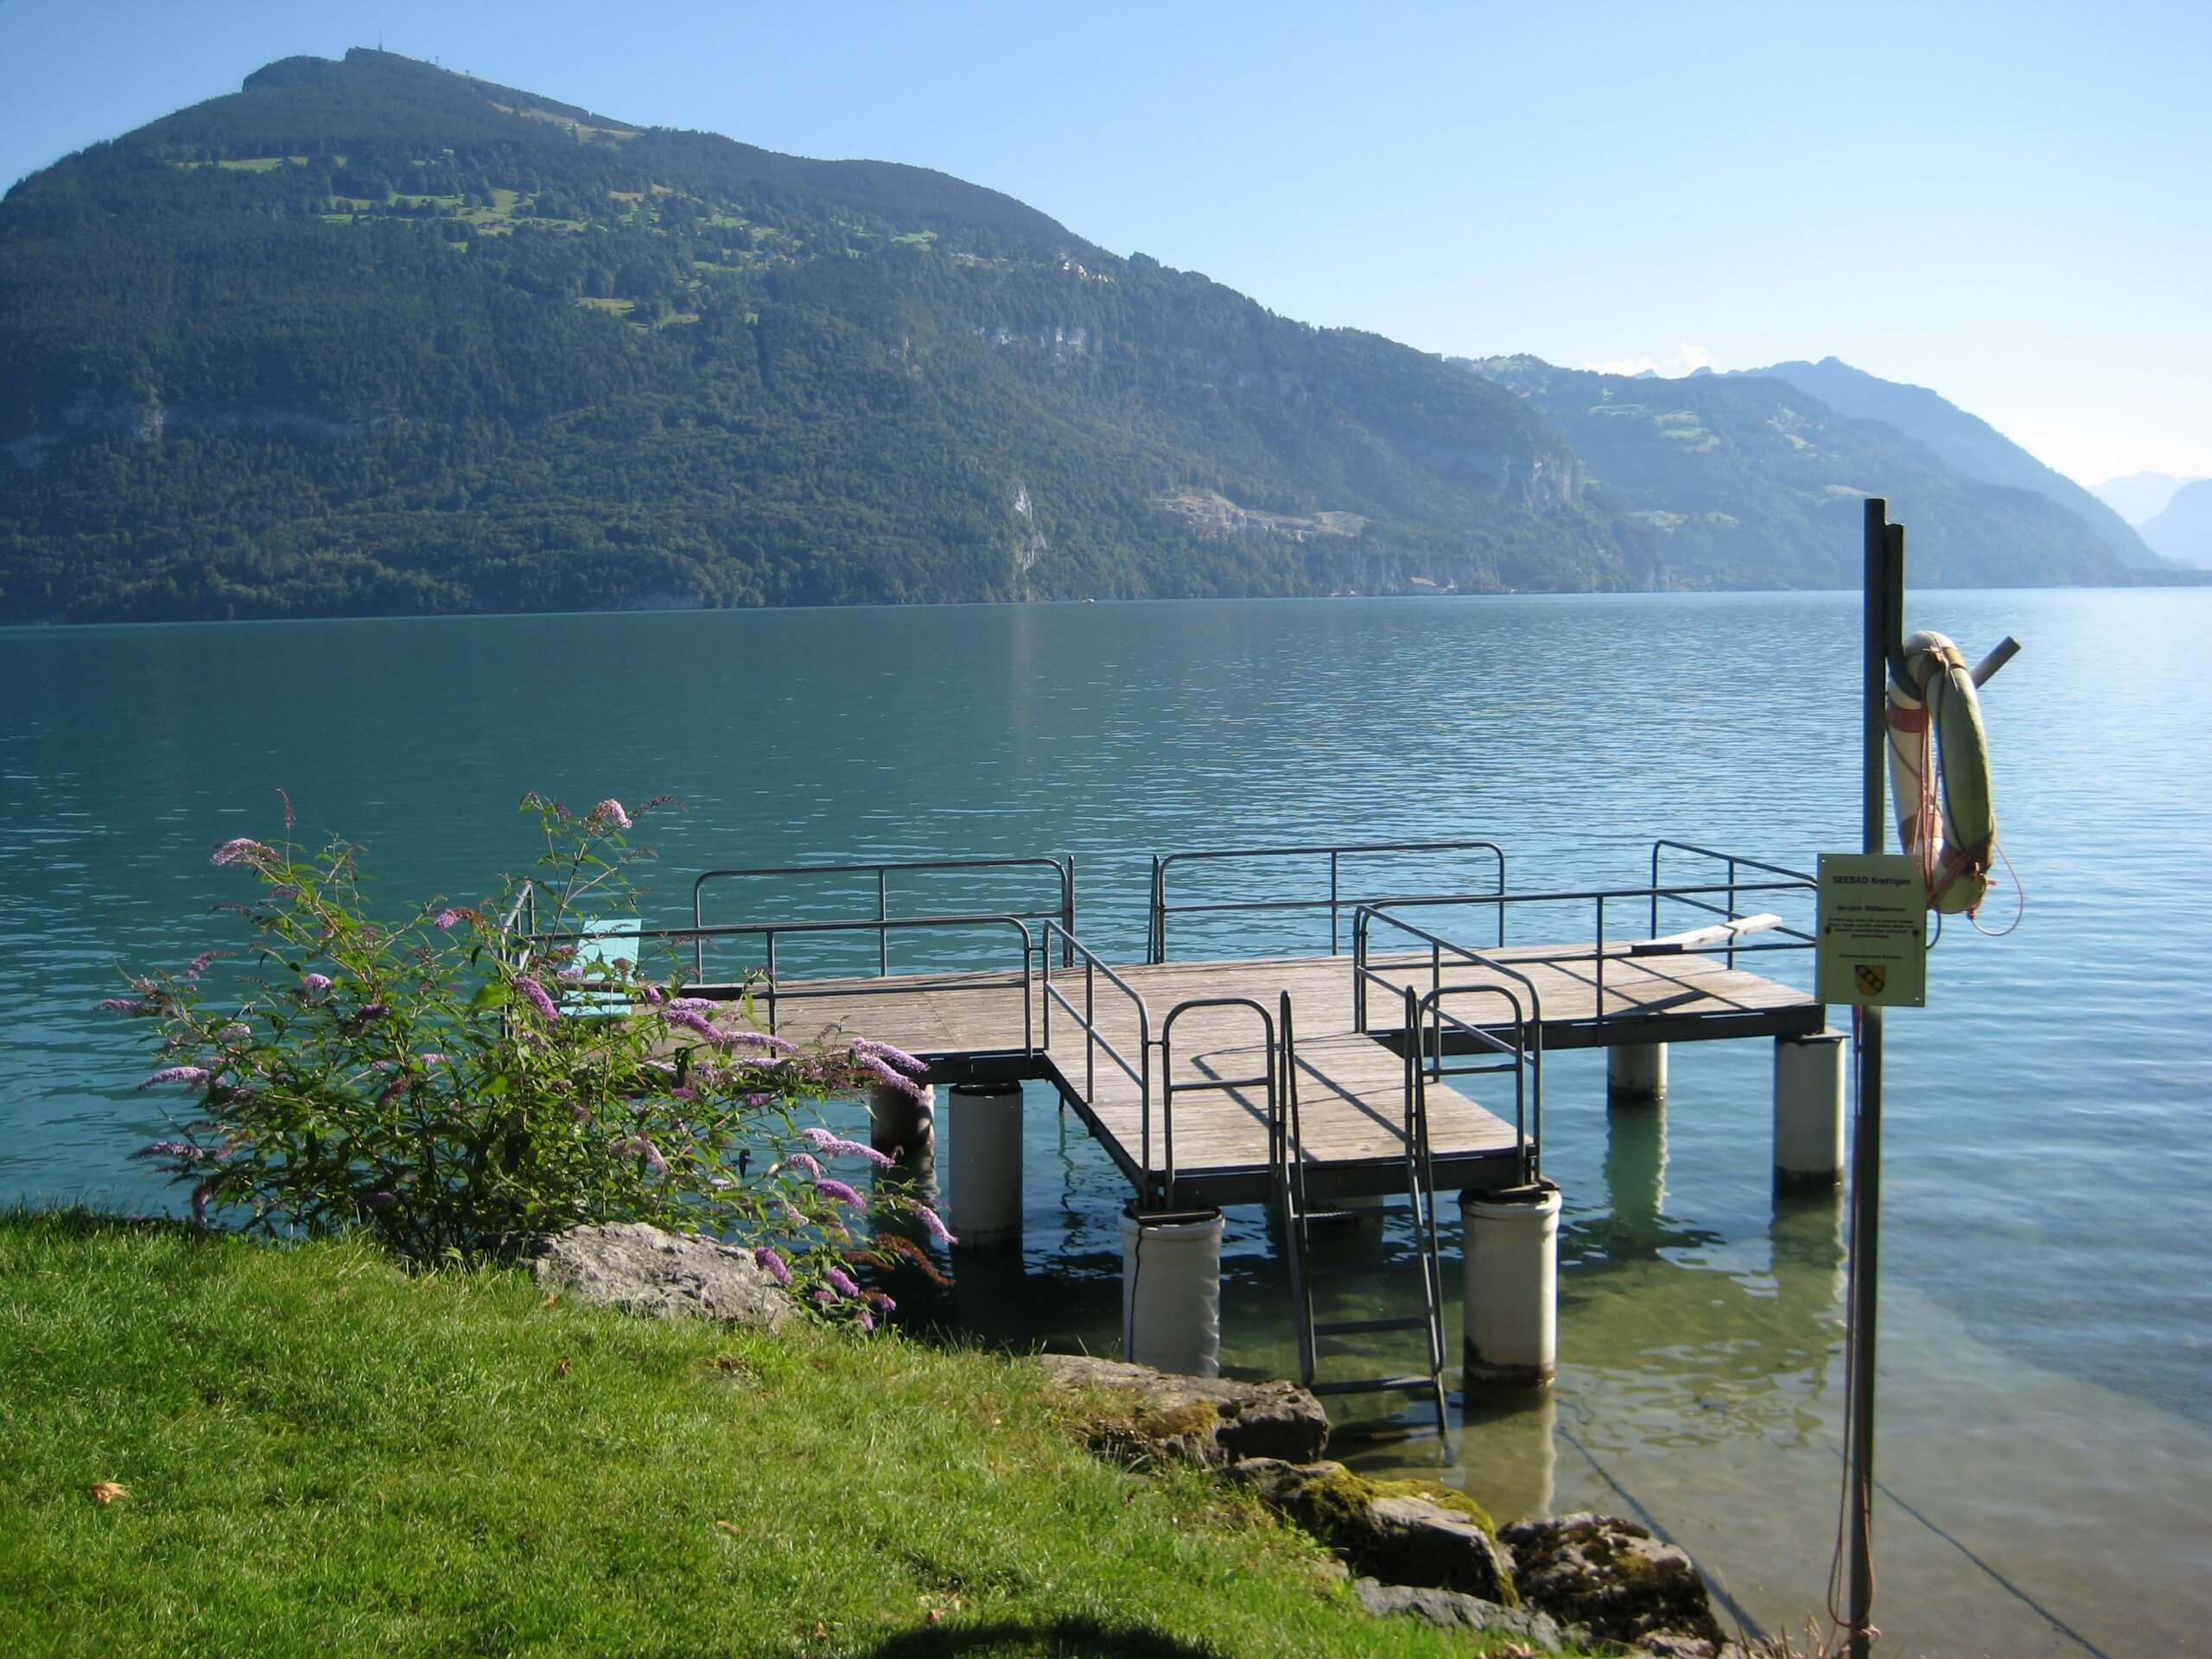 seebad-lido-thunersee-steg-sommer-baden